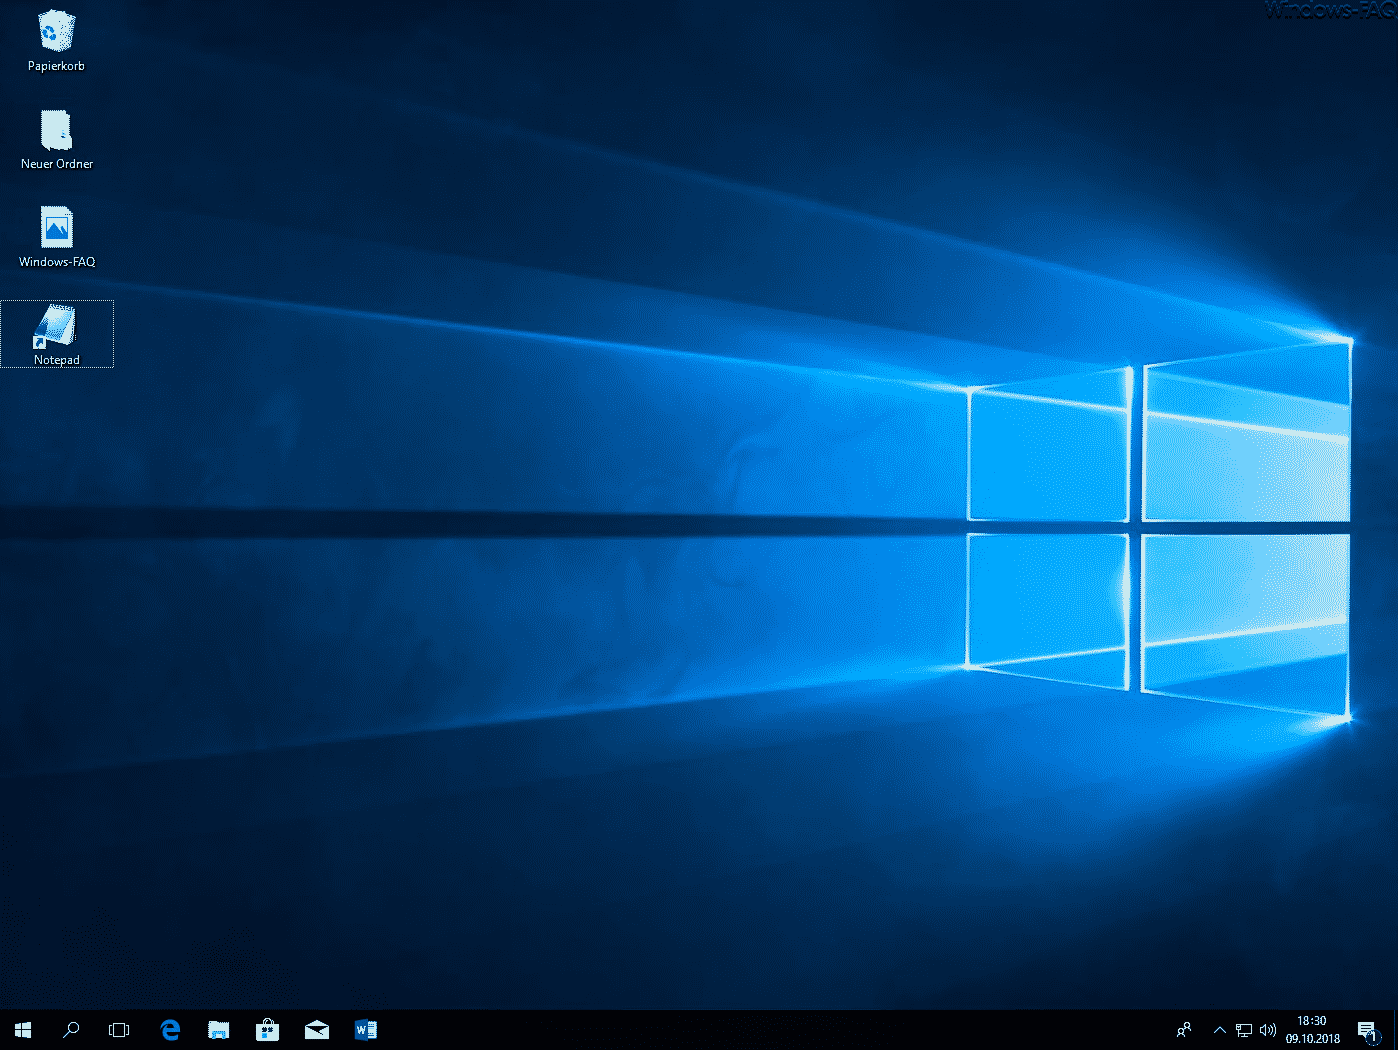 Windows Desktop mit Desktopsymbolen